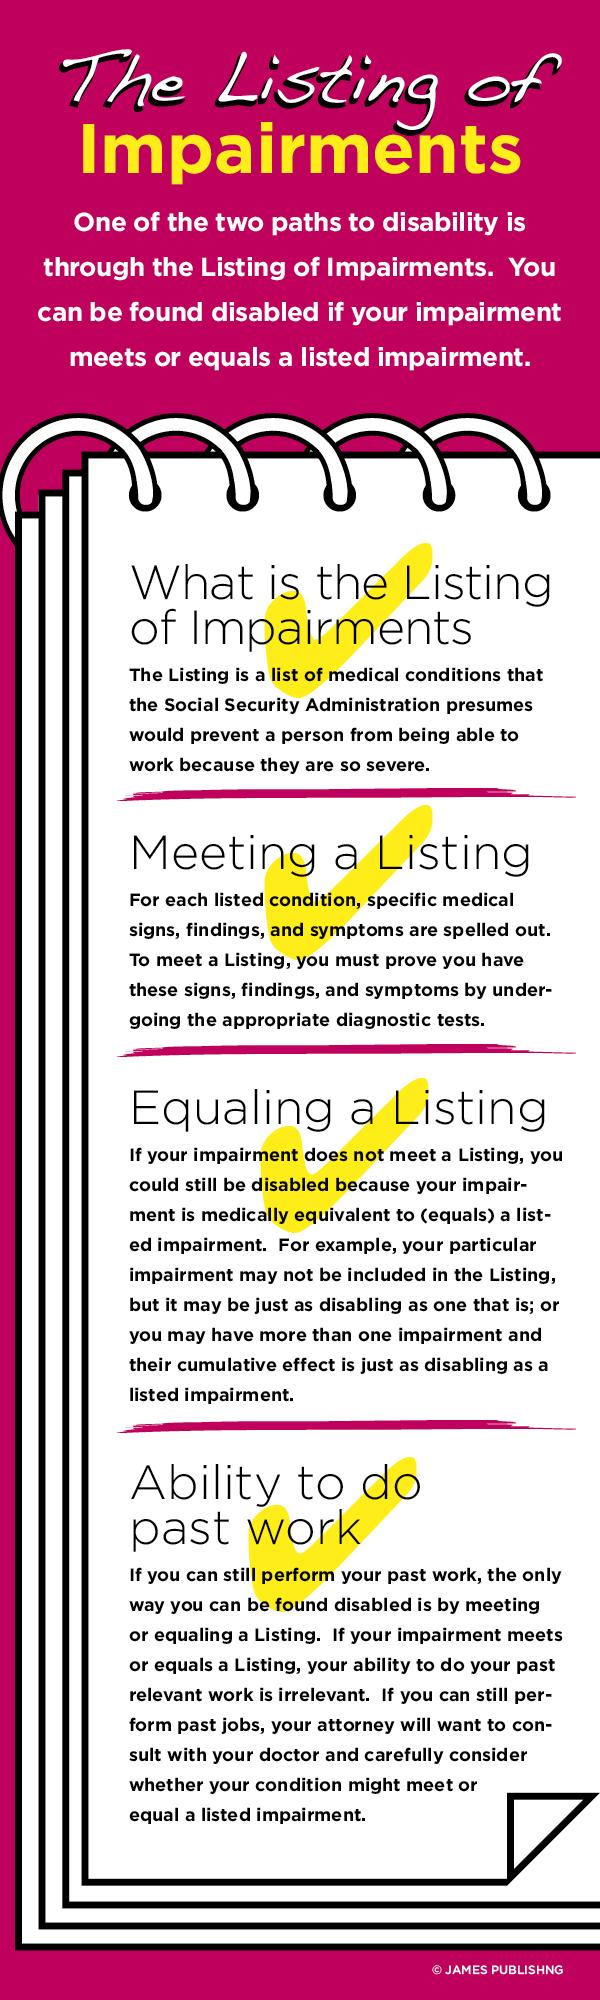 Jacksonville Beach Social Security disability lawyers